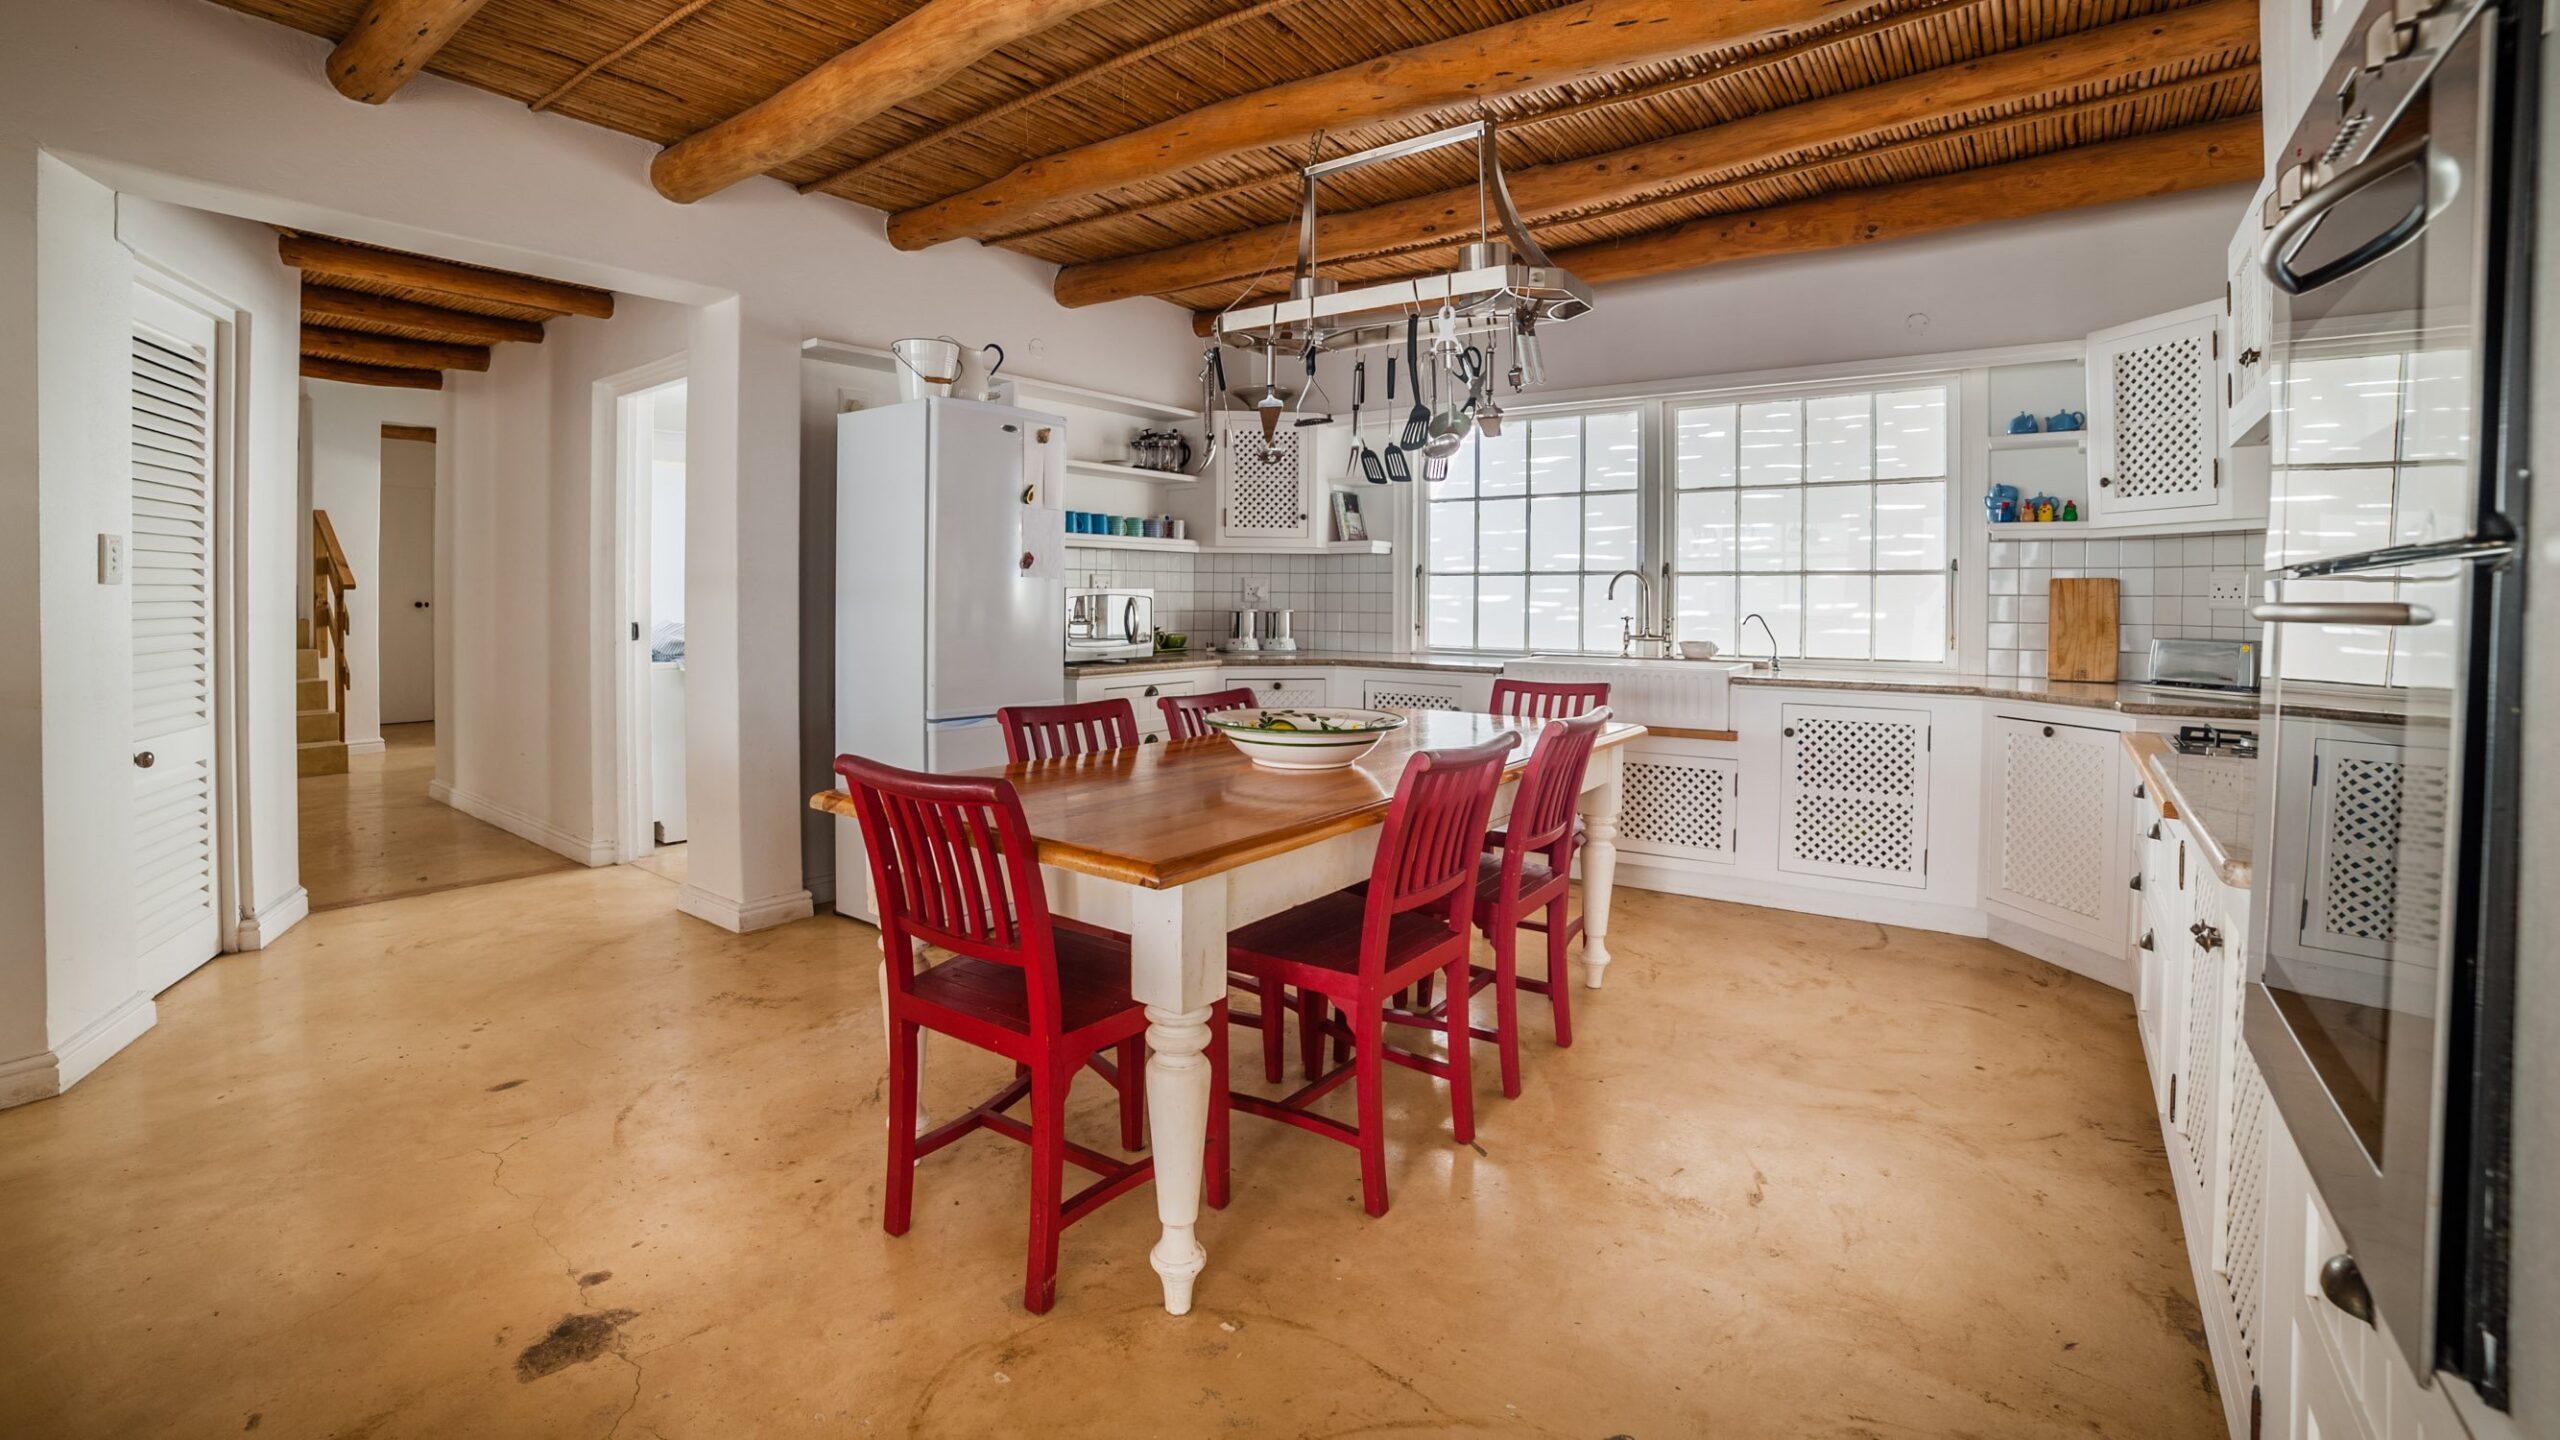 charel-schreuder-photography-property-photography-kitchen